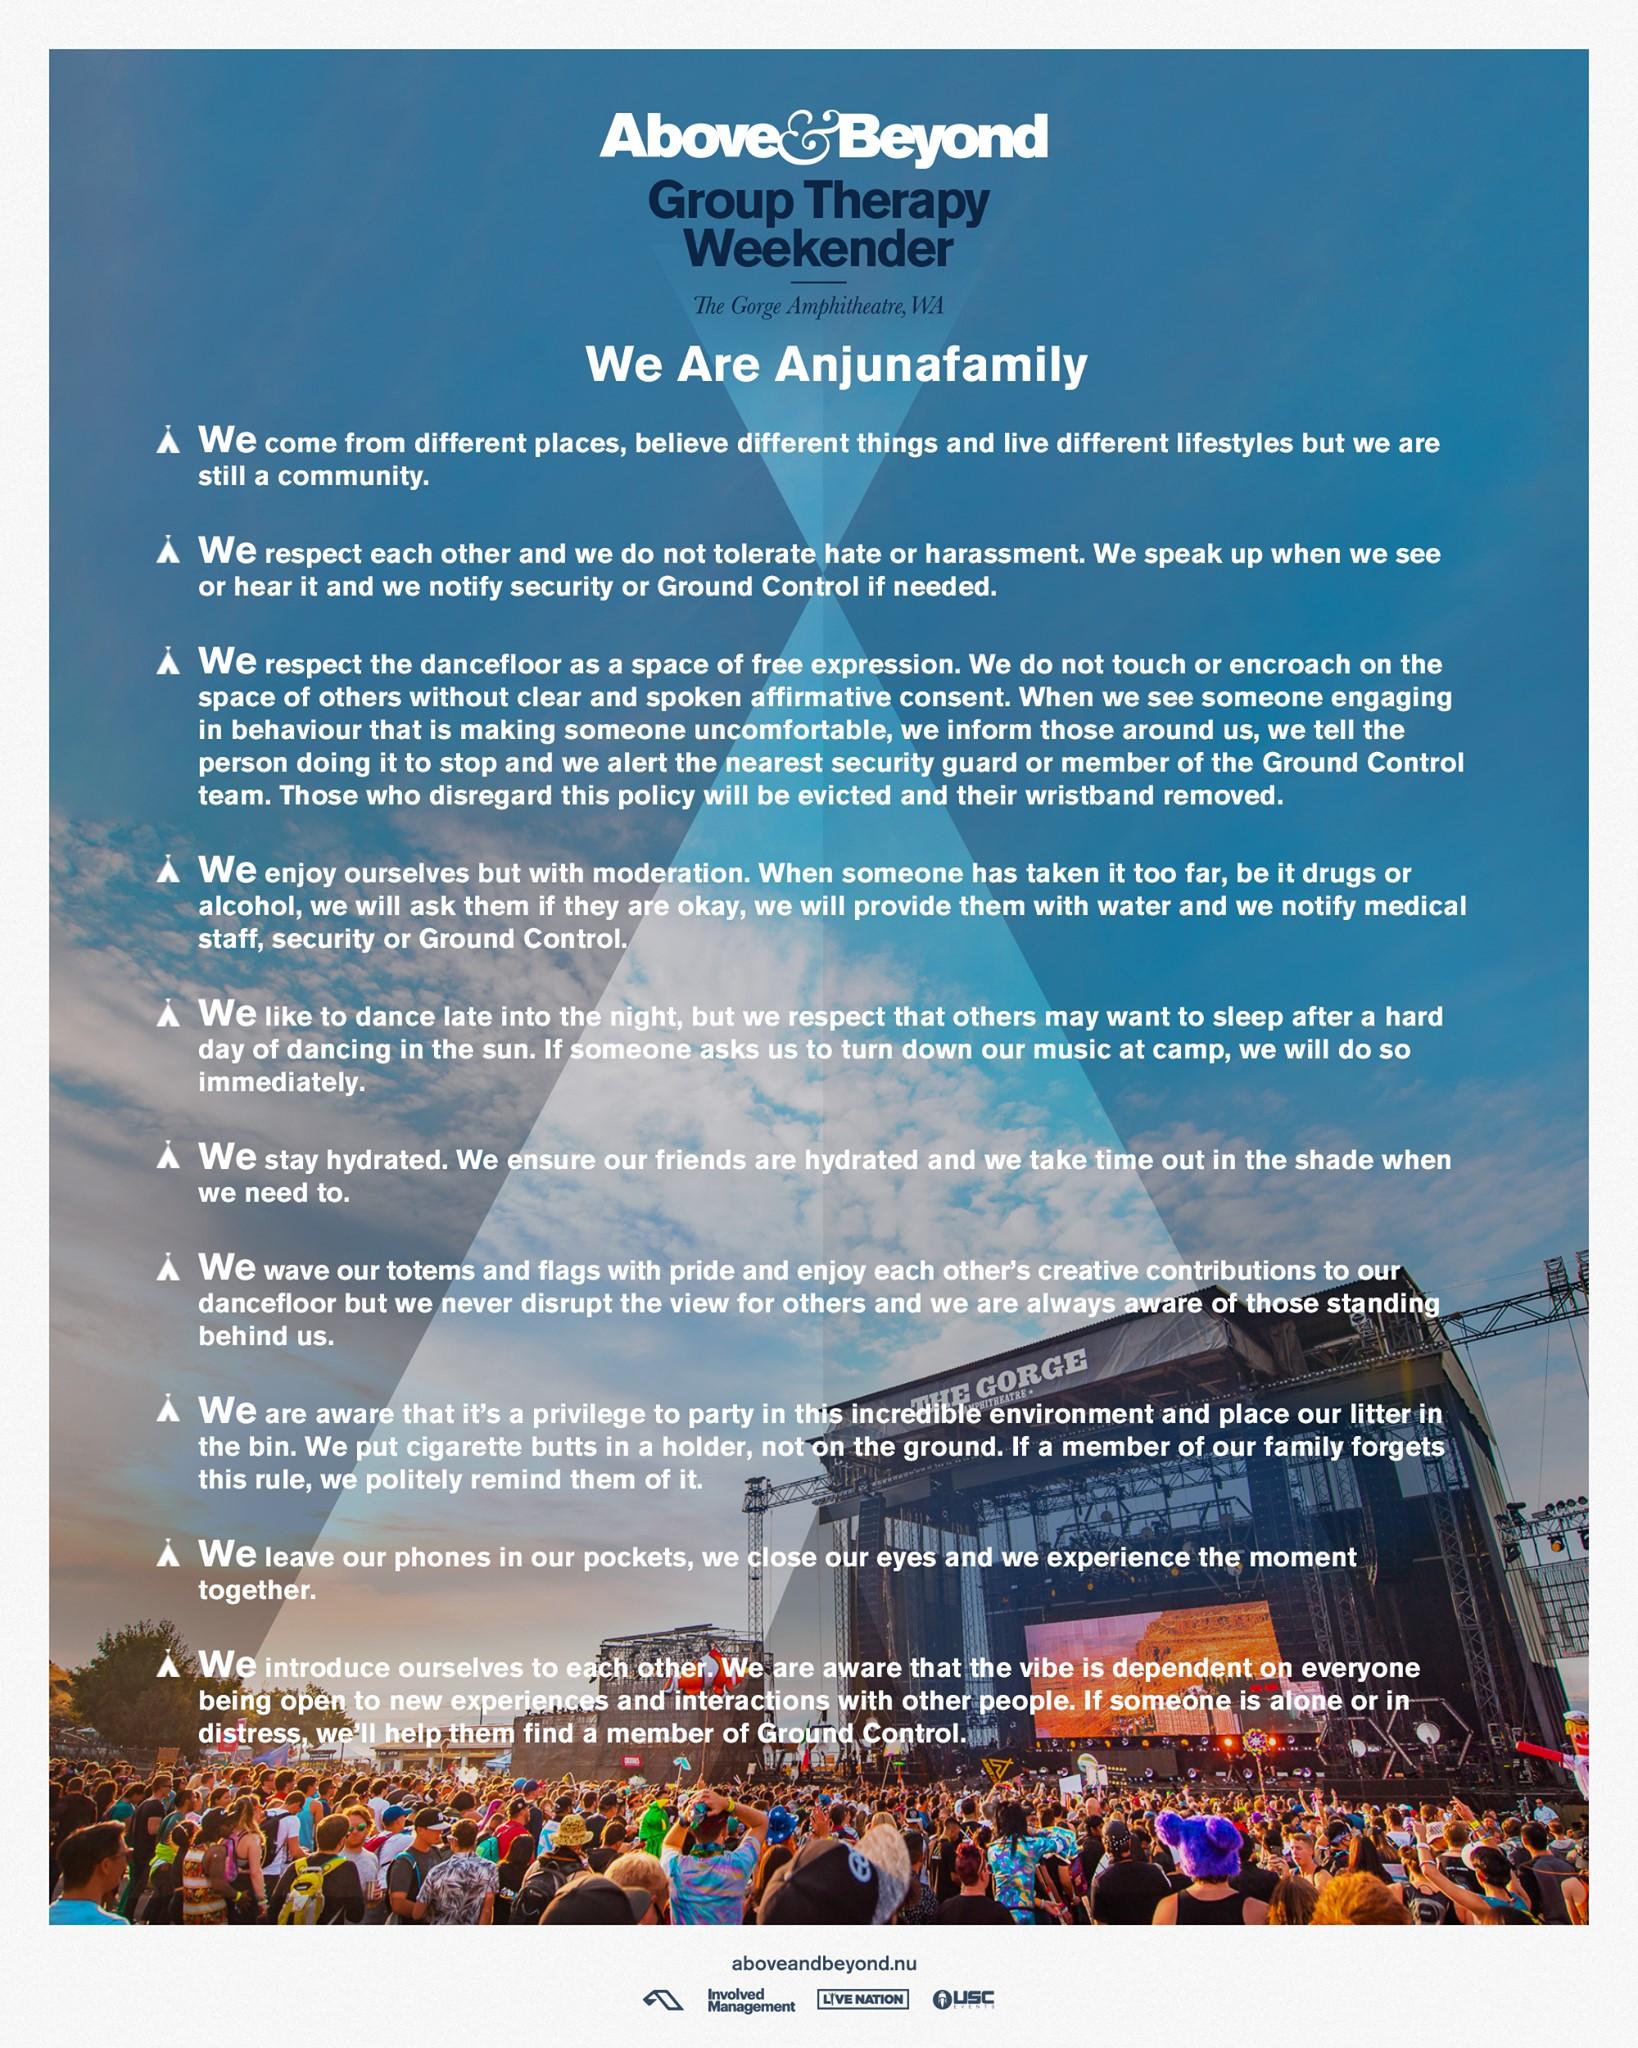 Group Therapy Weekender 2019 Anjunafamily Manifesto